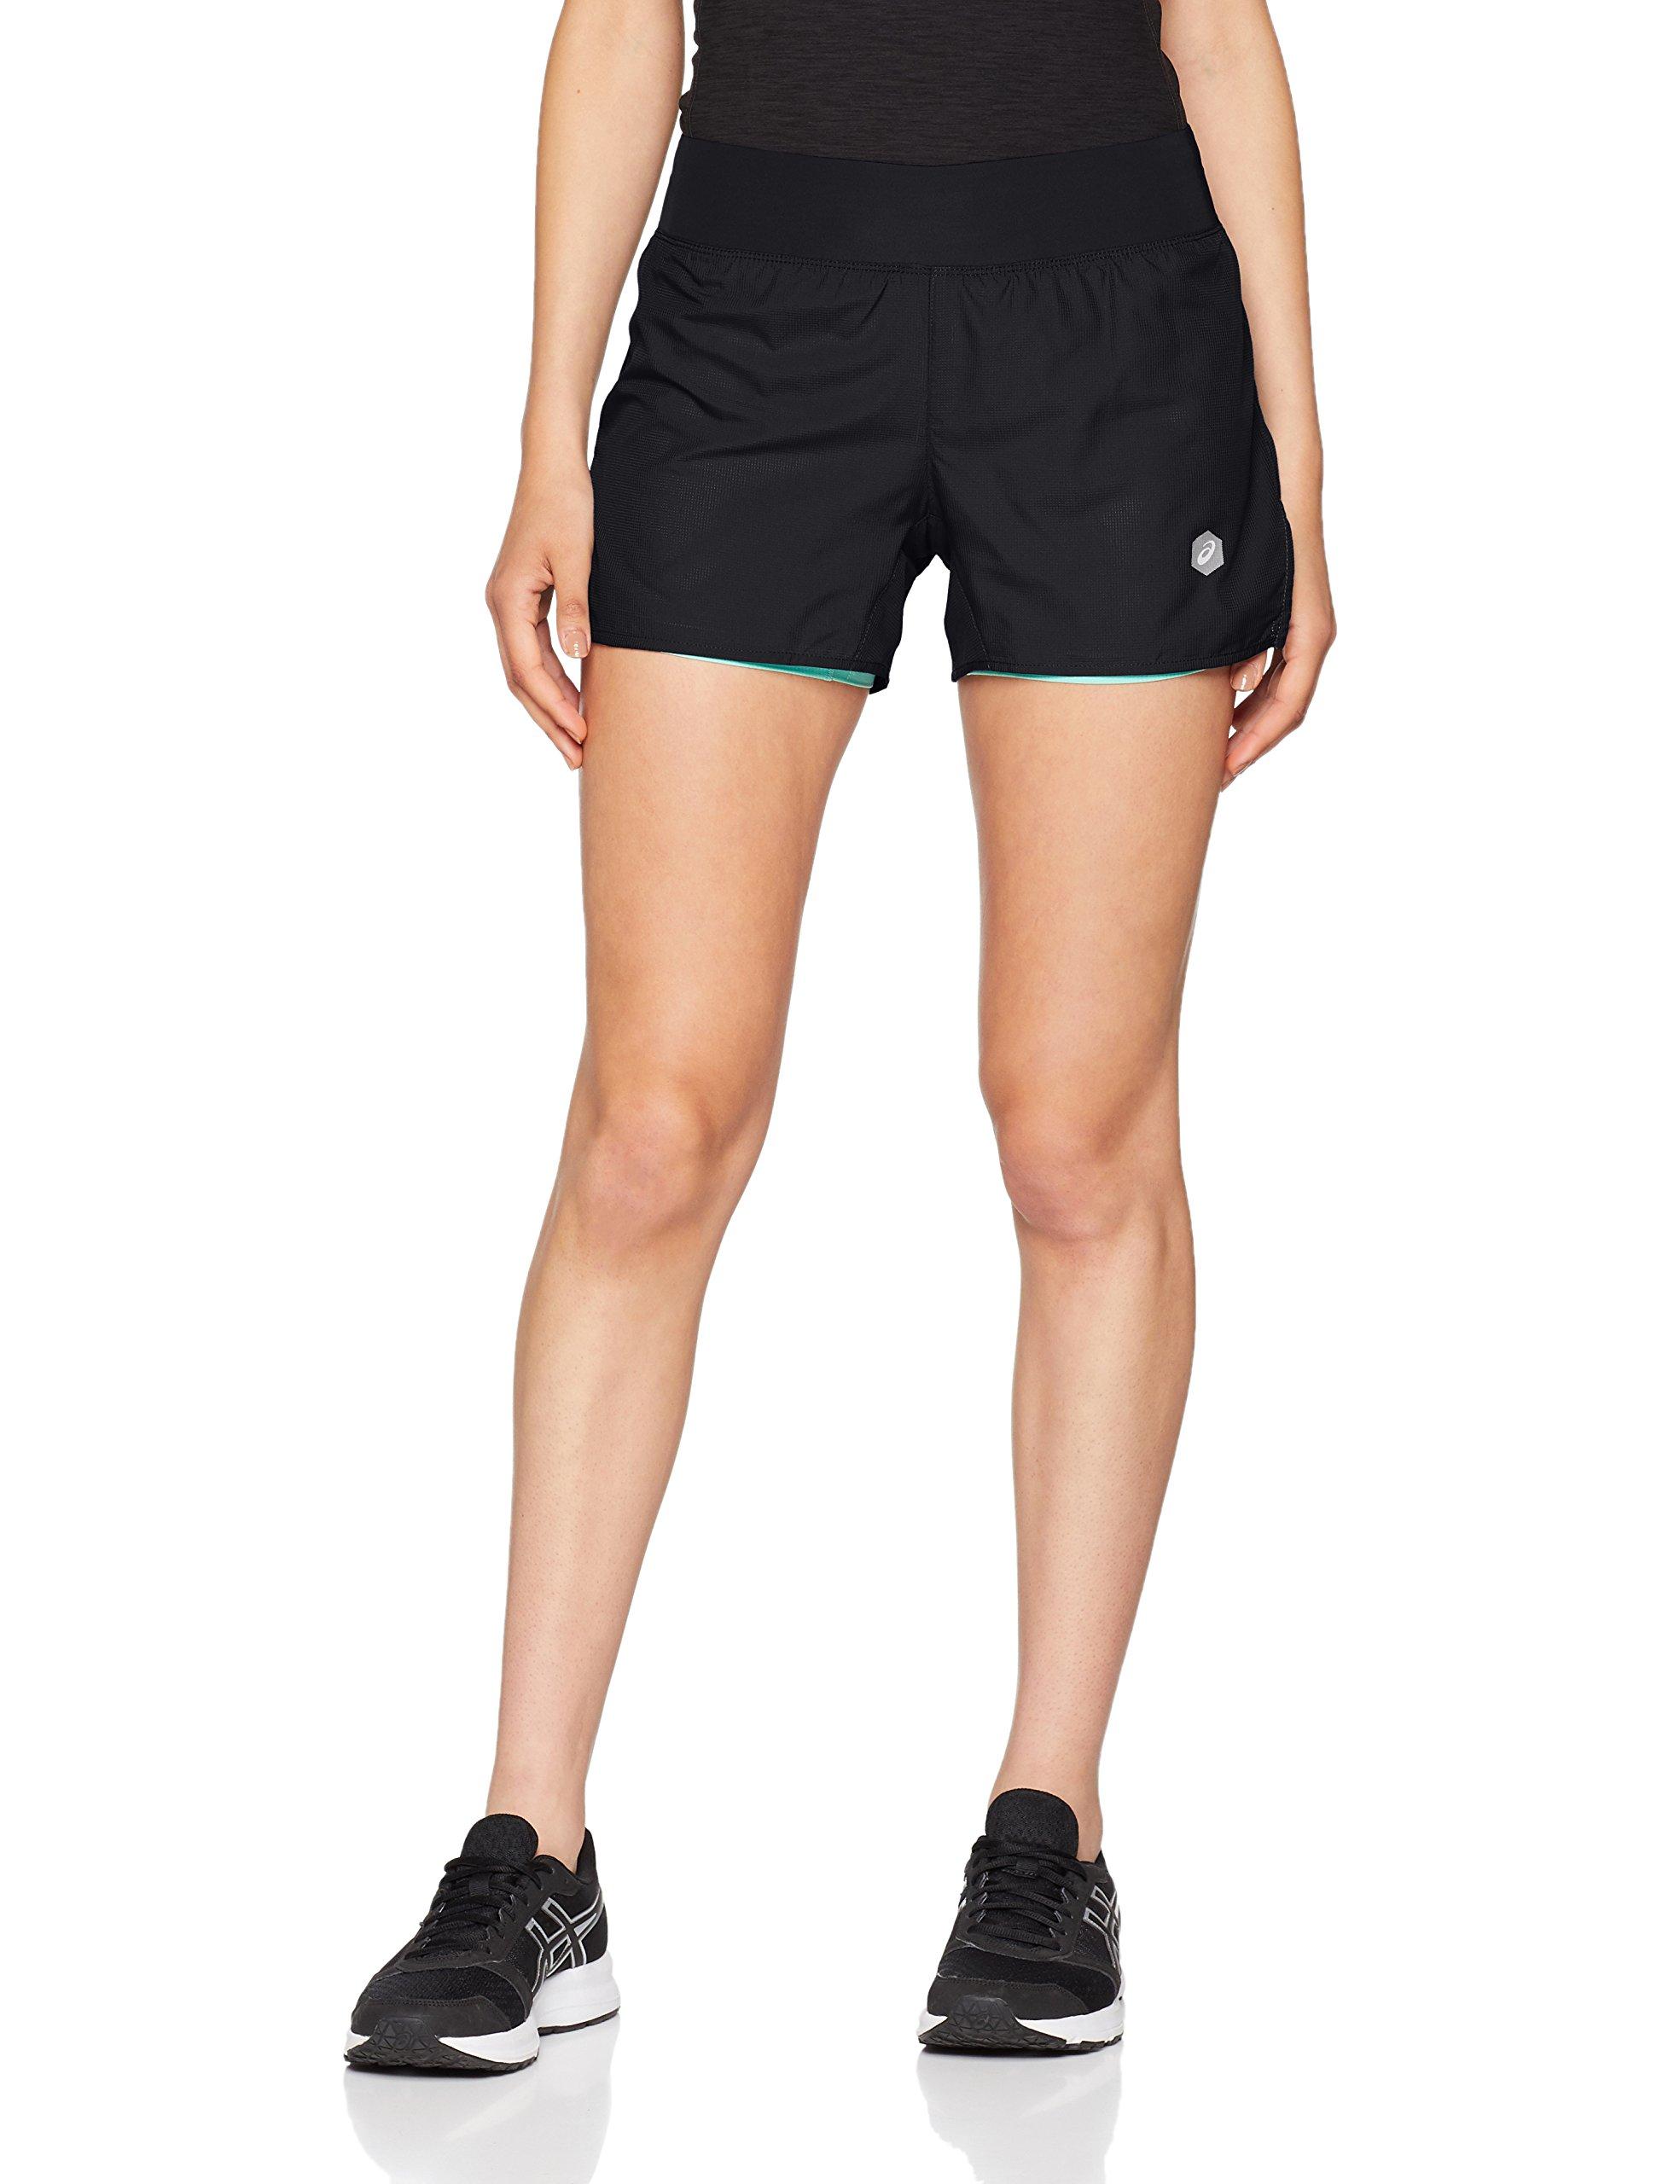 Asics Damen Cool 2-in-1 3.5 Zoll Shorts